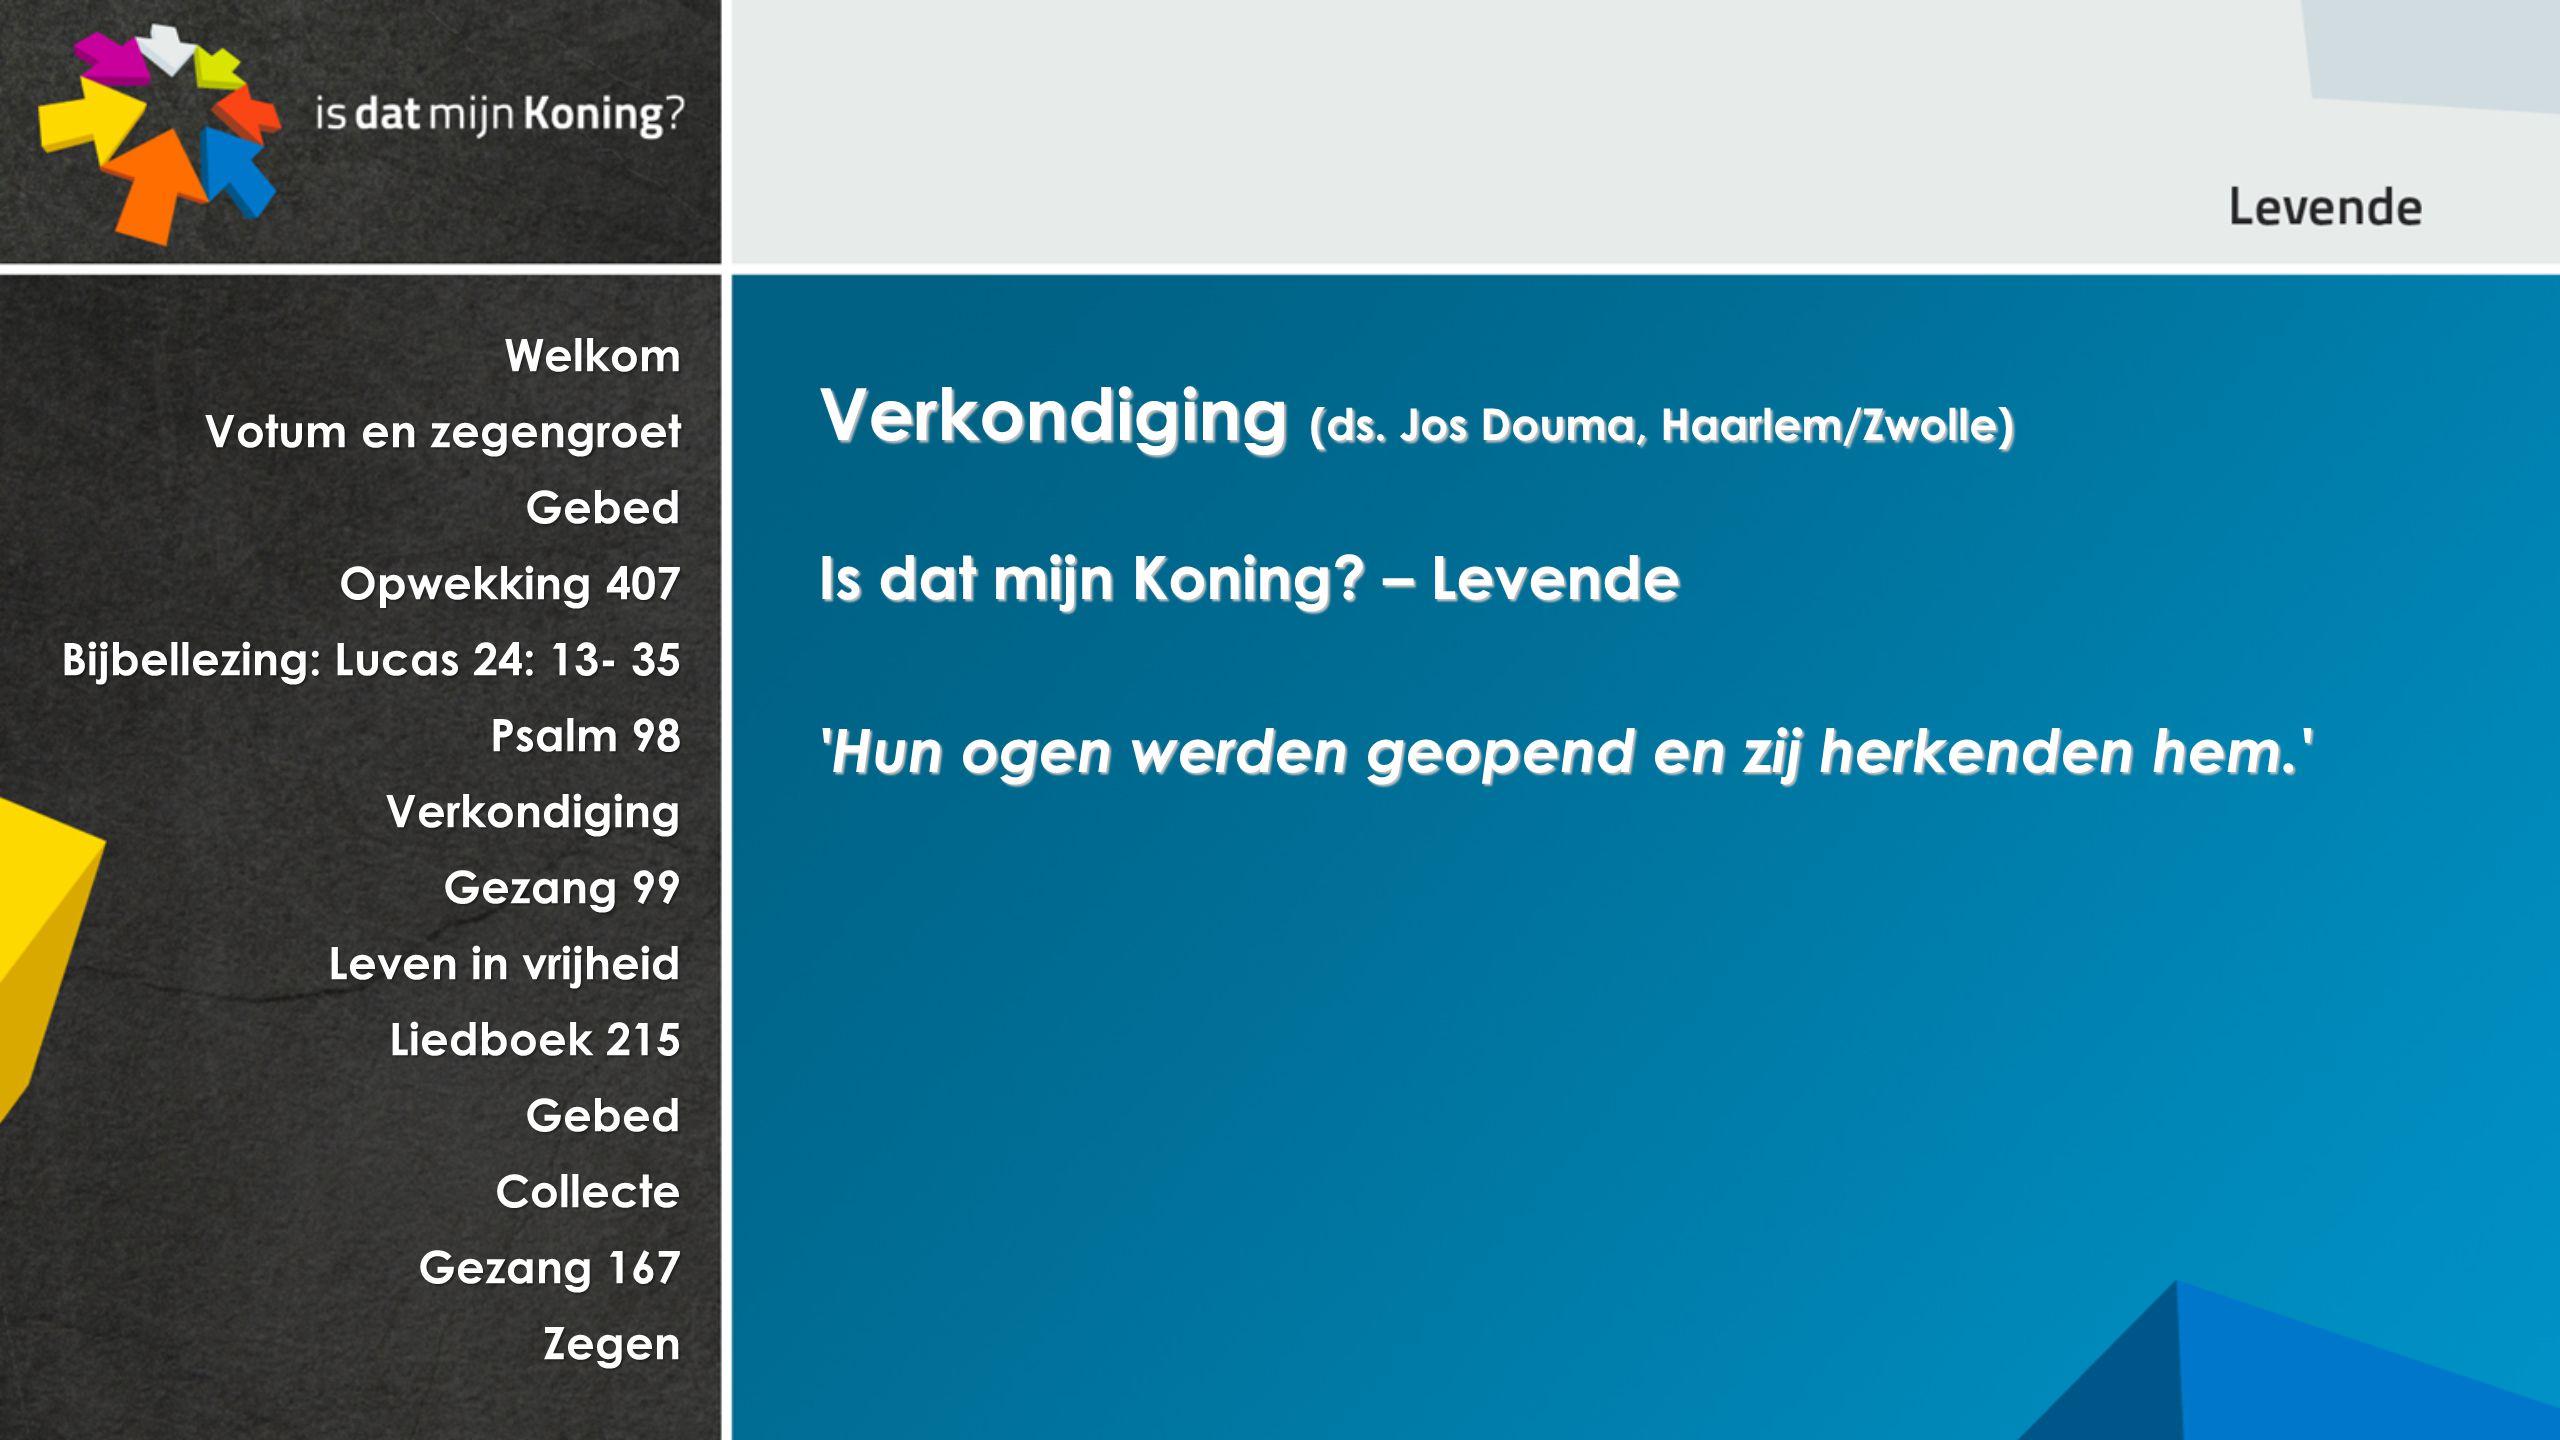 Verkondiging (ds. Jos Douma, Haarlem/Zwolle)